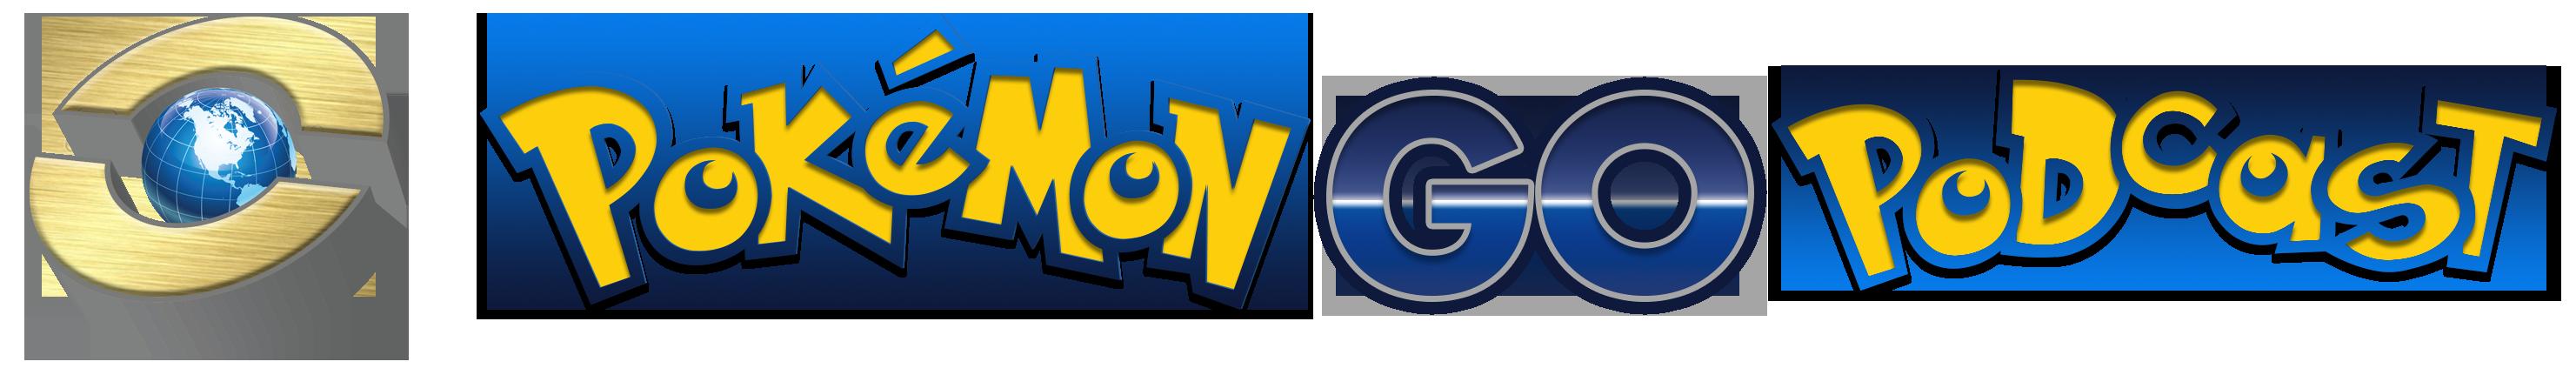 pokemon go podcast png logo #3163